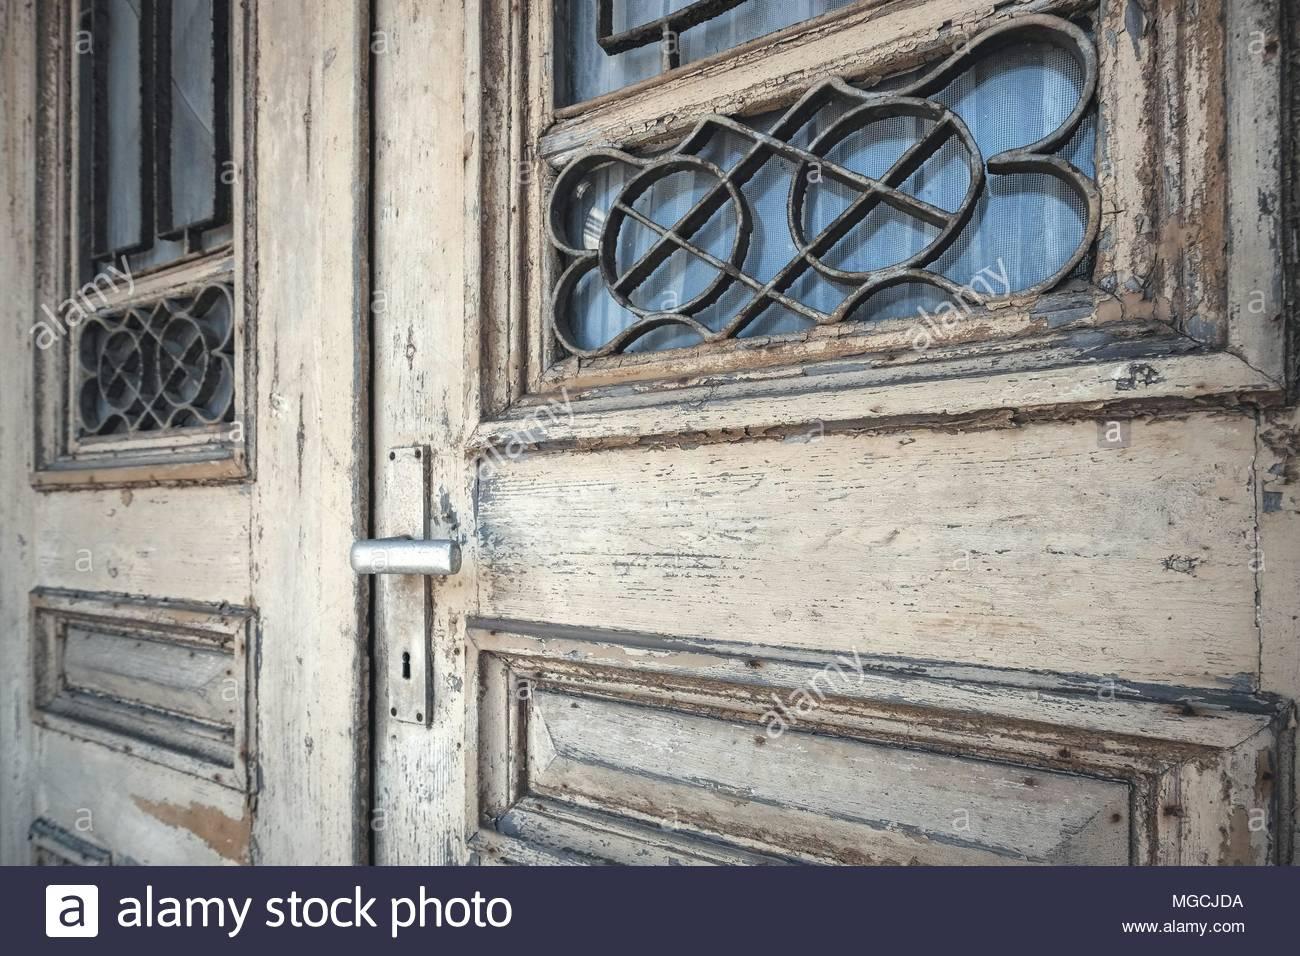 Alte, marode Haustür aus Holz Imagen De Stock